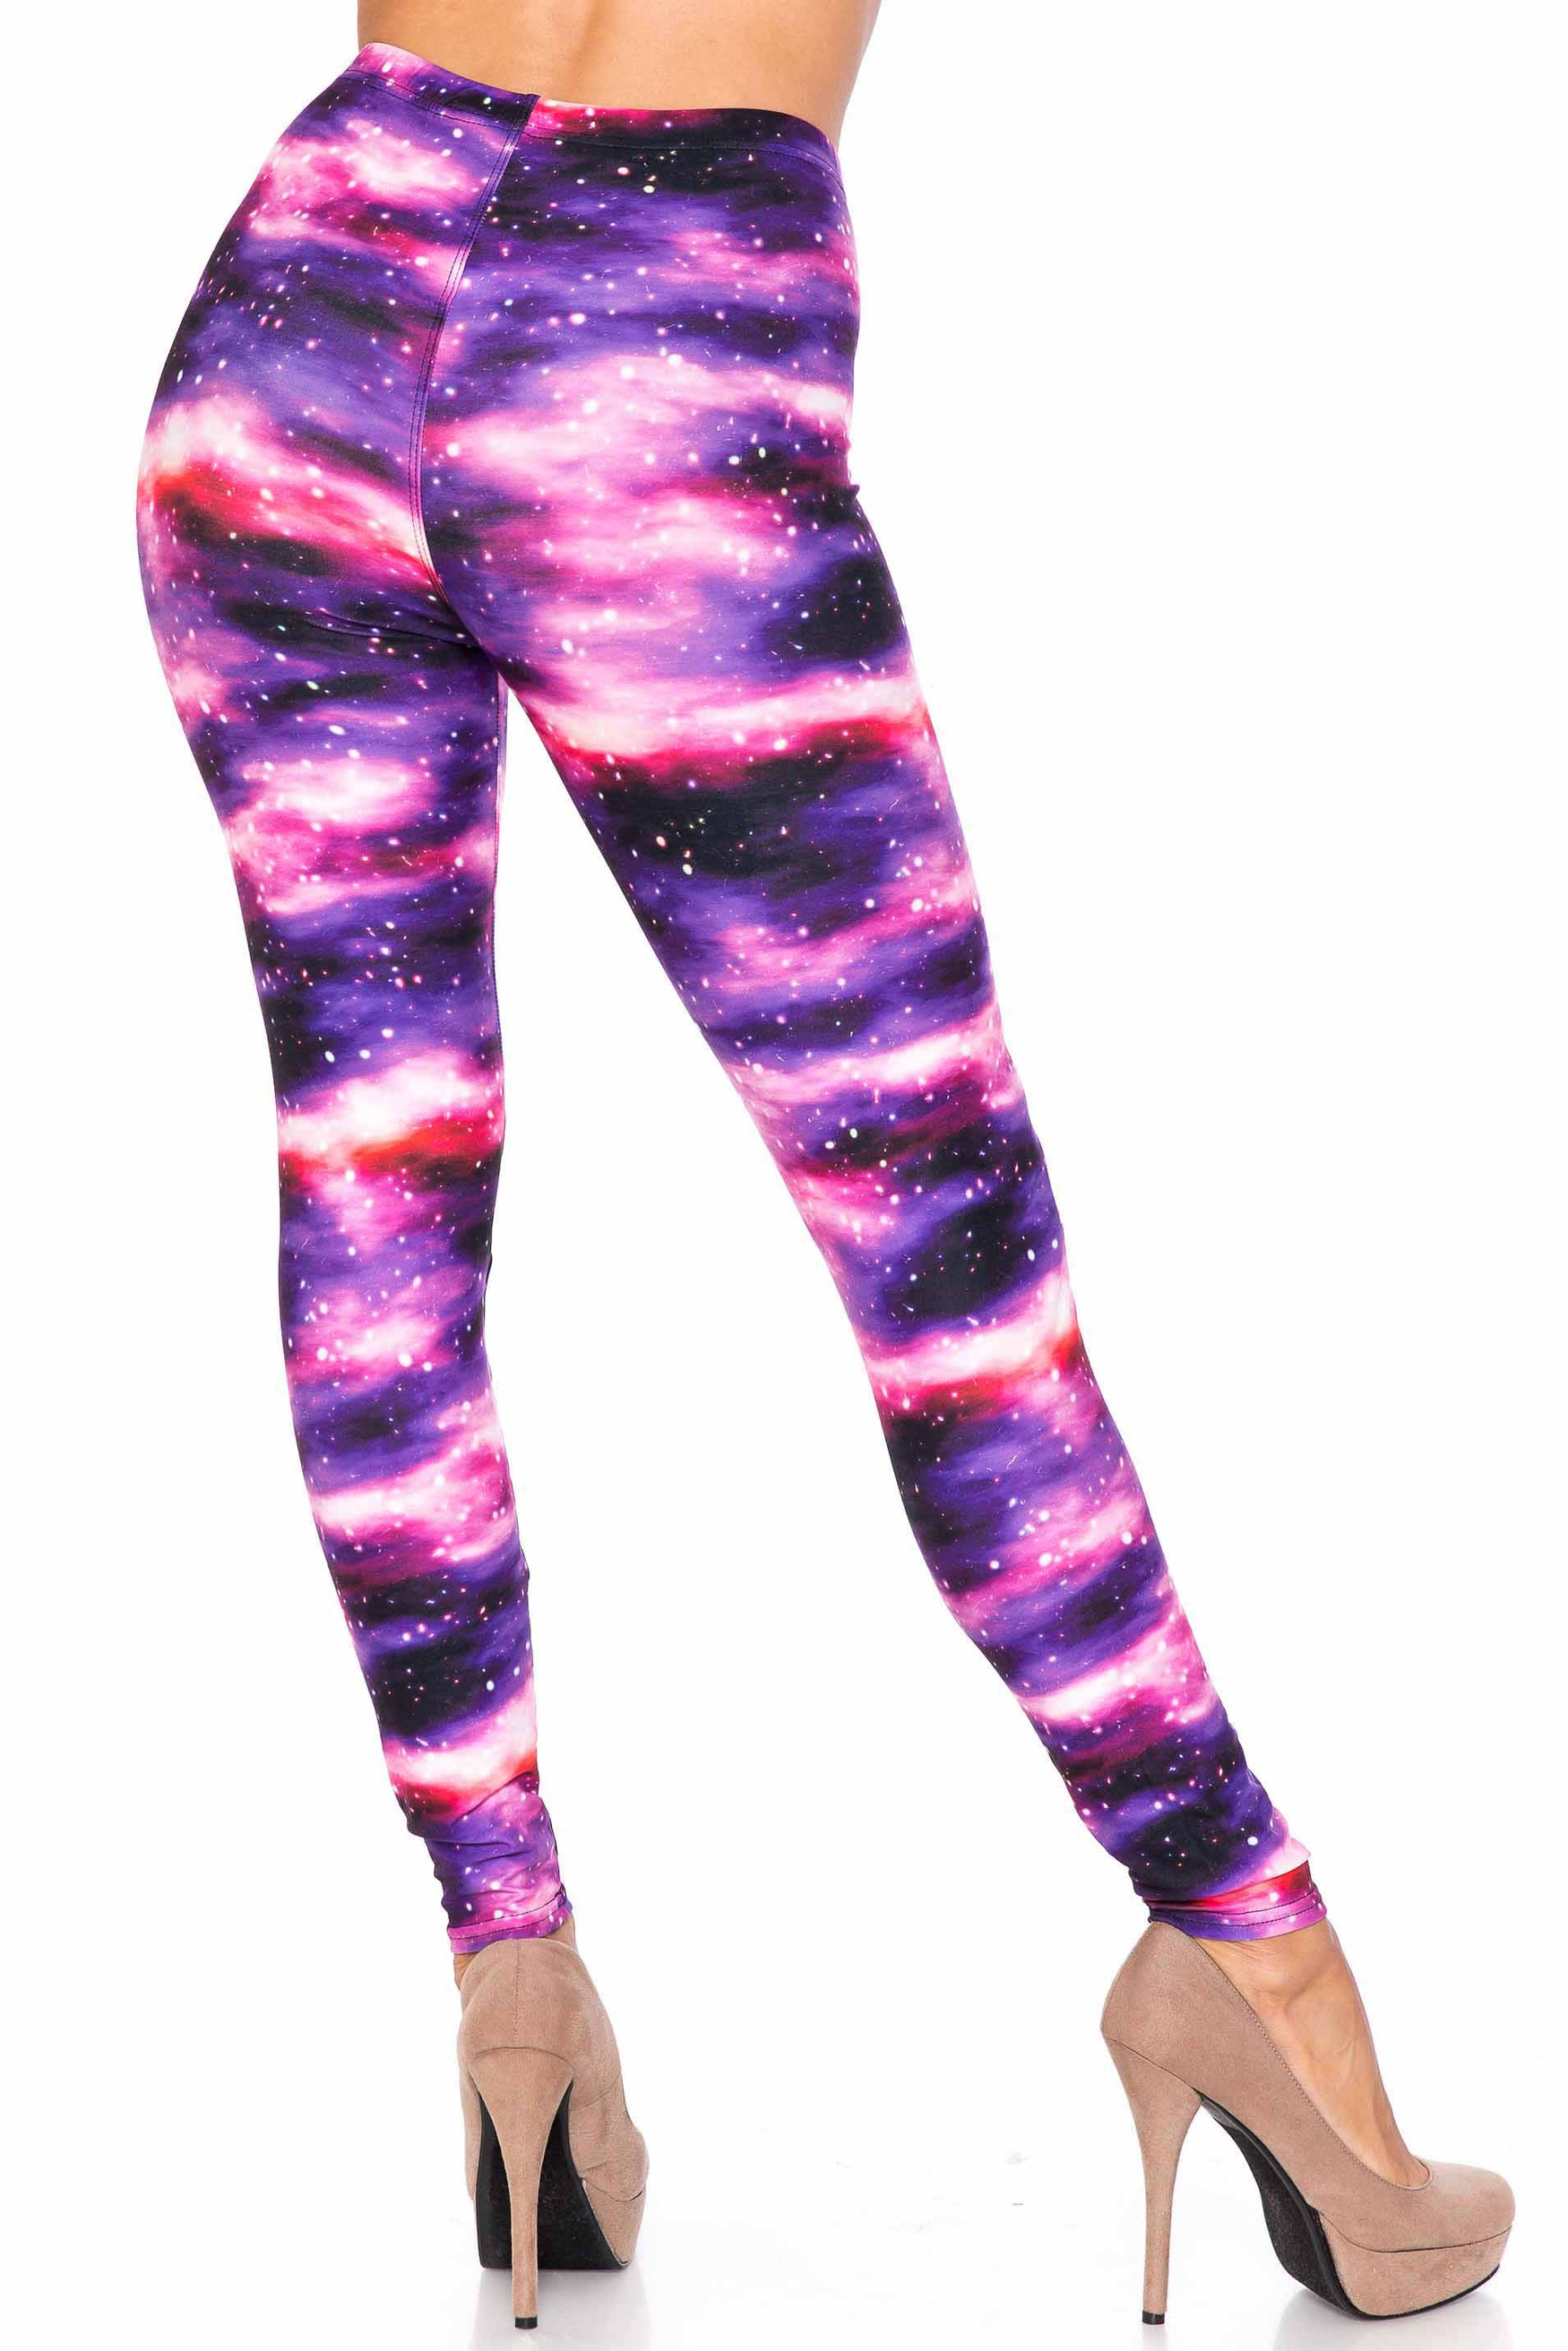 Creamy Soft Purple Mist Extra Plus Size Leggings - 3X-5X - USA Fashion™